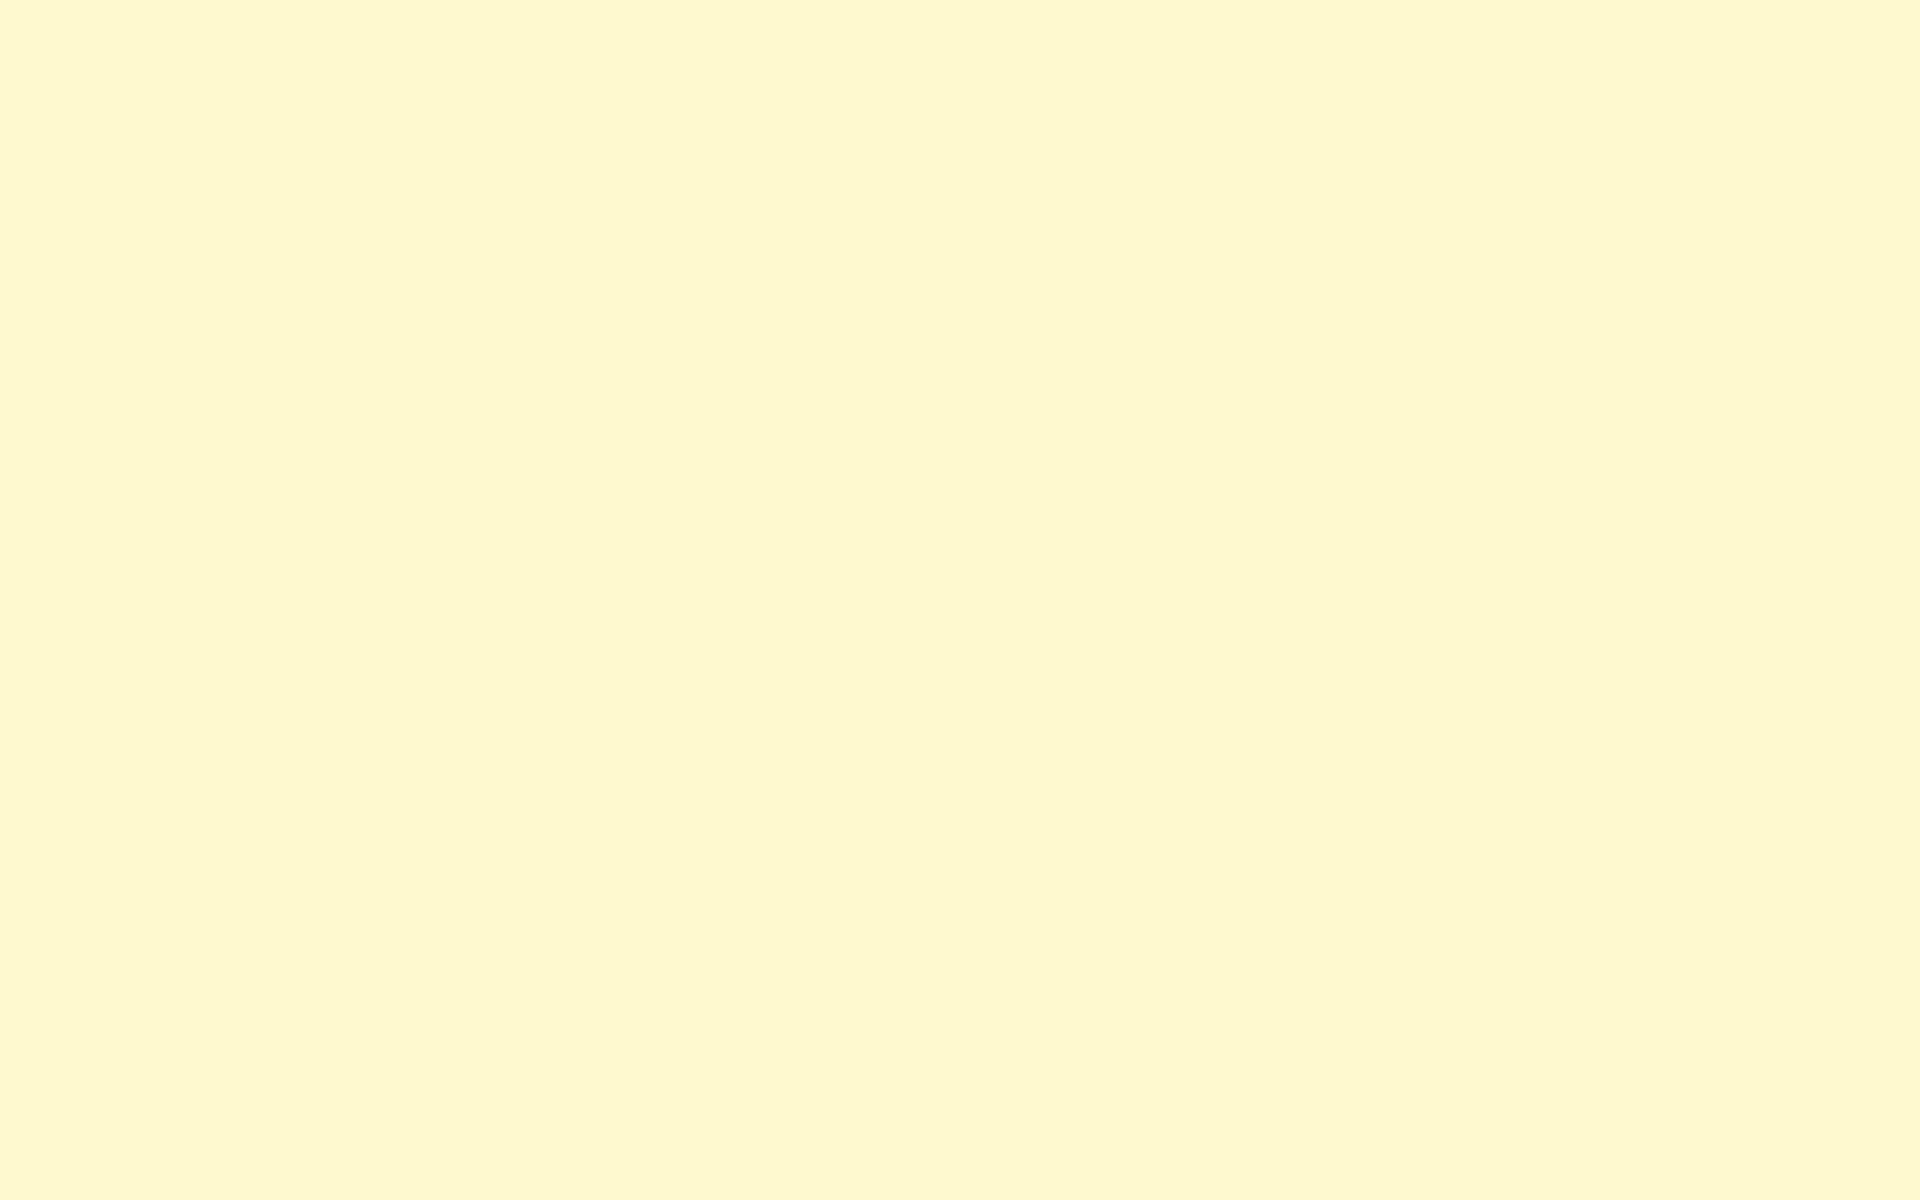 1920x1200 Lemon Chiffon Solid Color Background